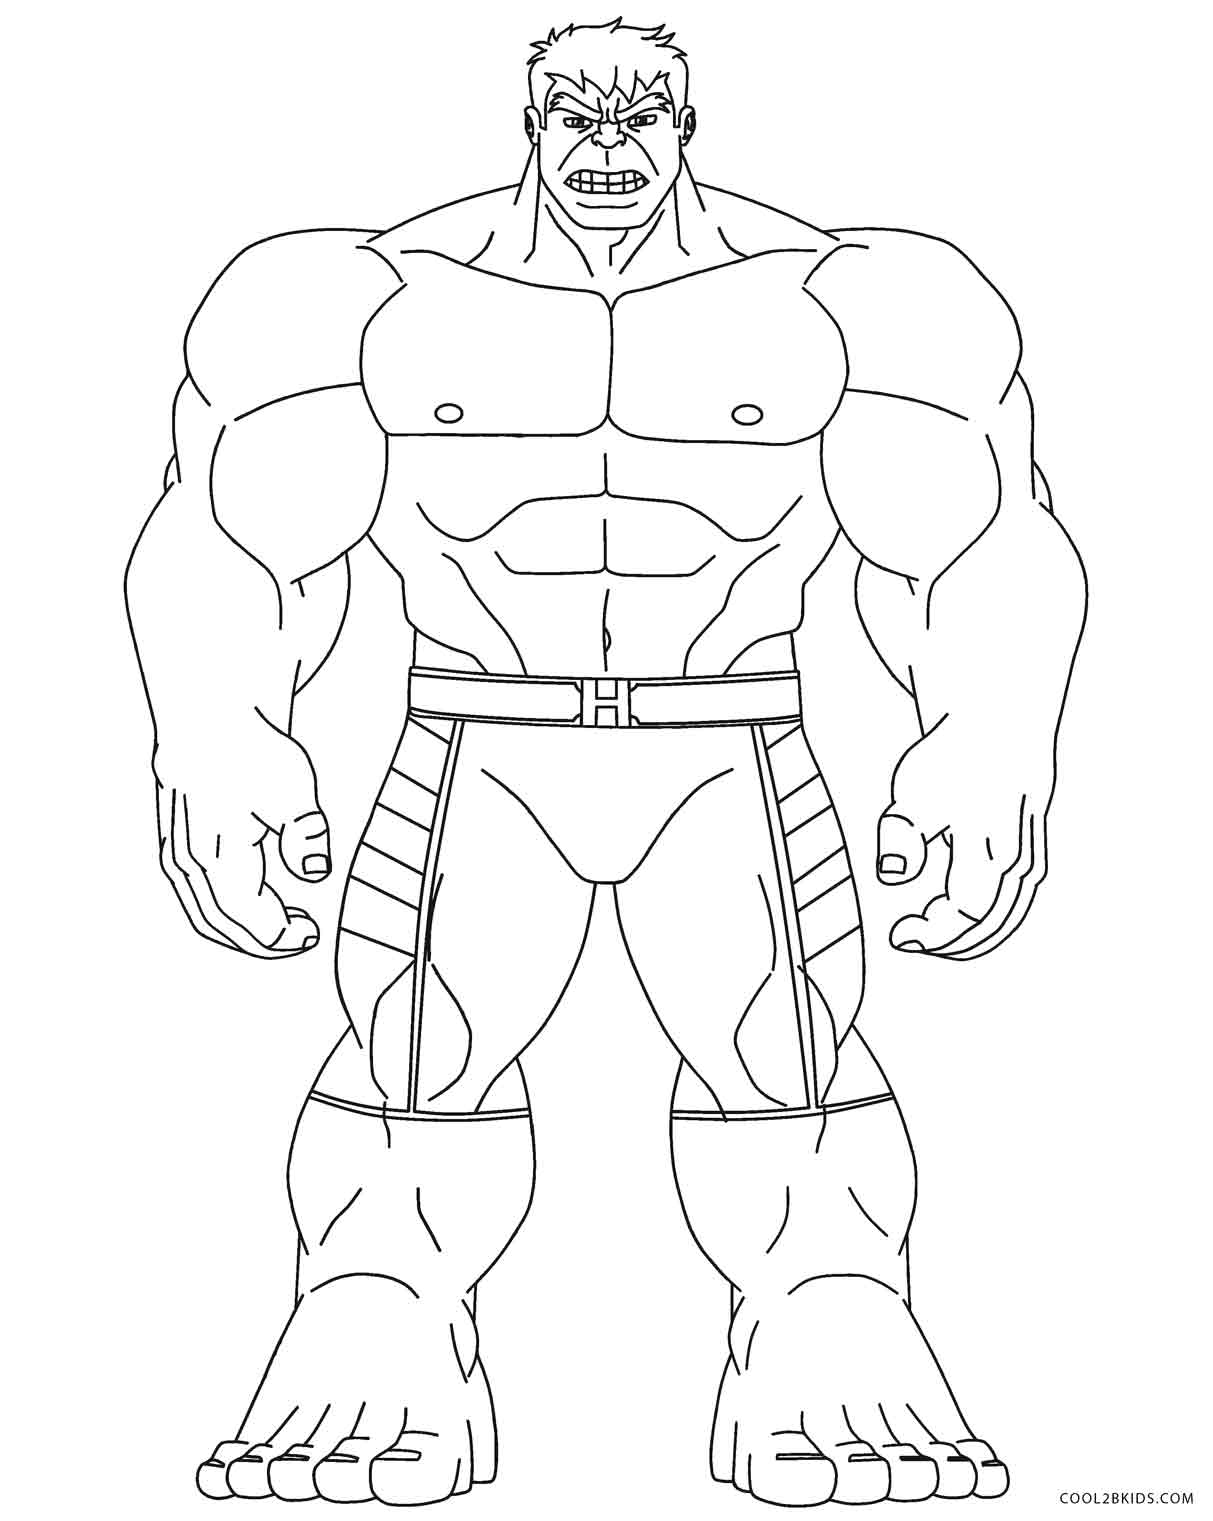 printable hulk coloring pages free printable hulk coloring pages for kids cool2bkids printable pages hulk coloring